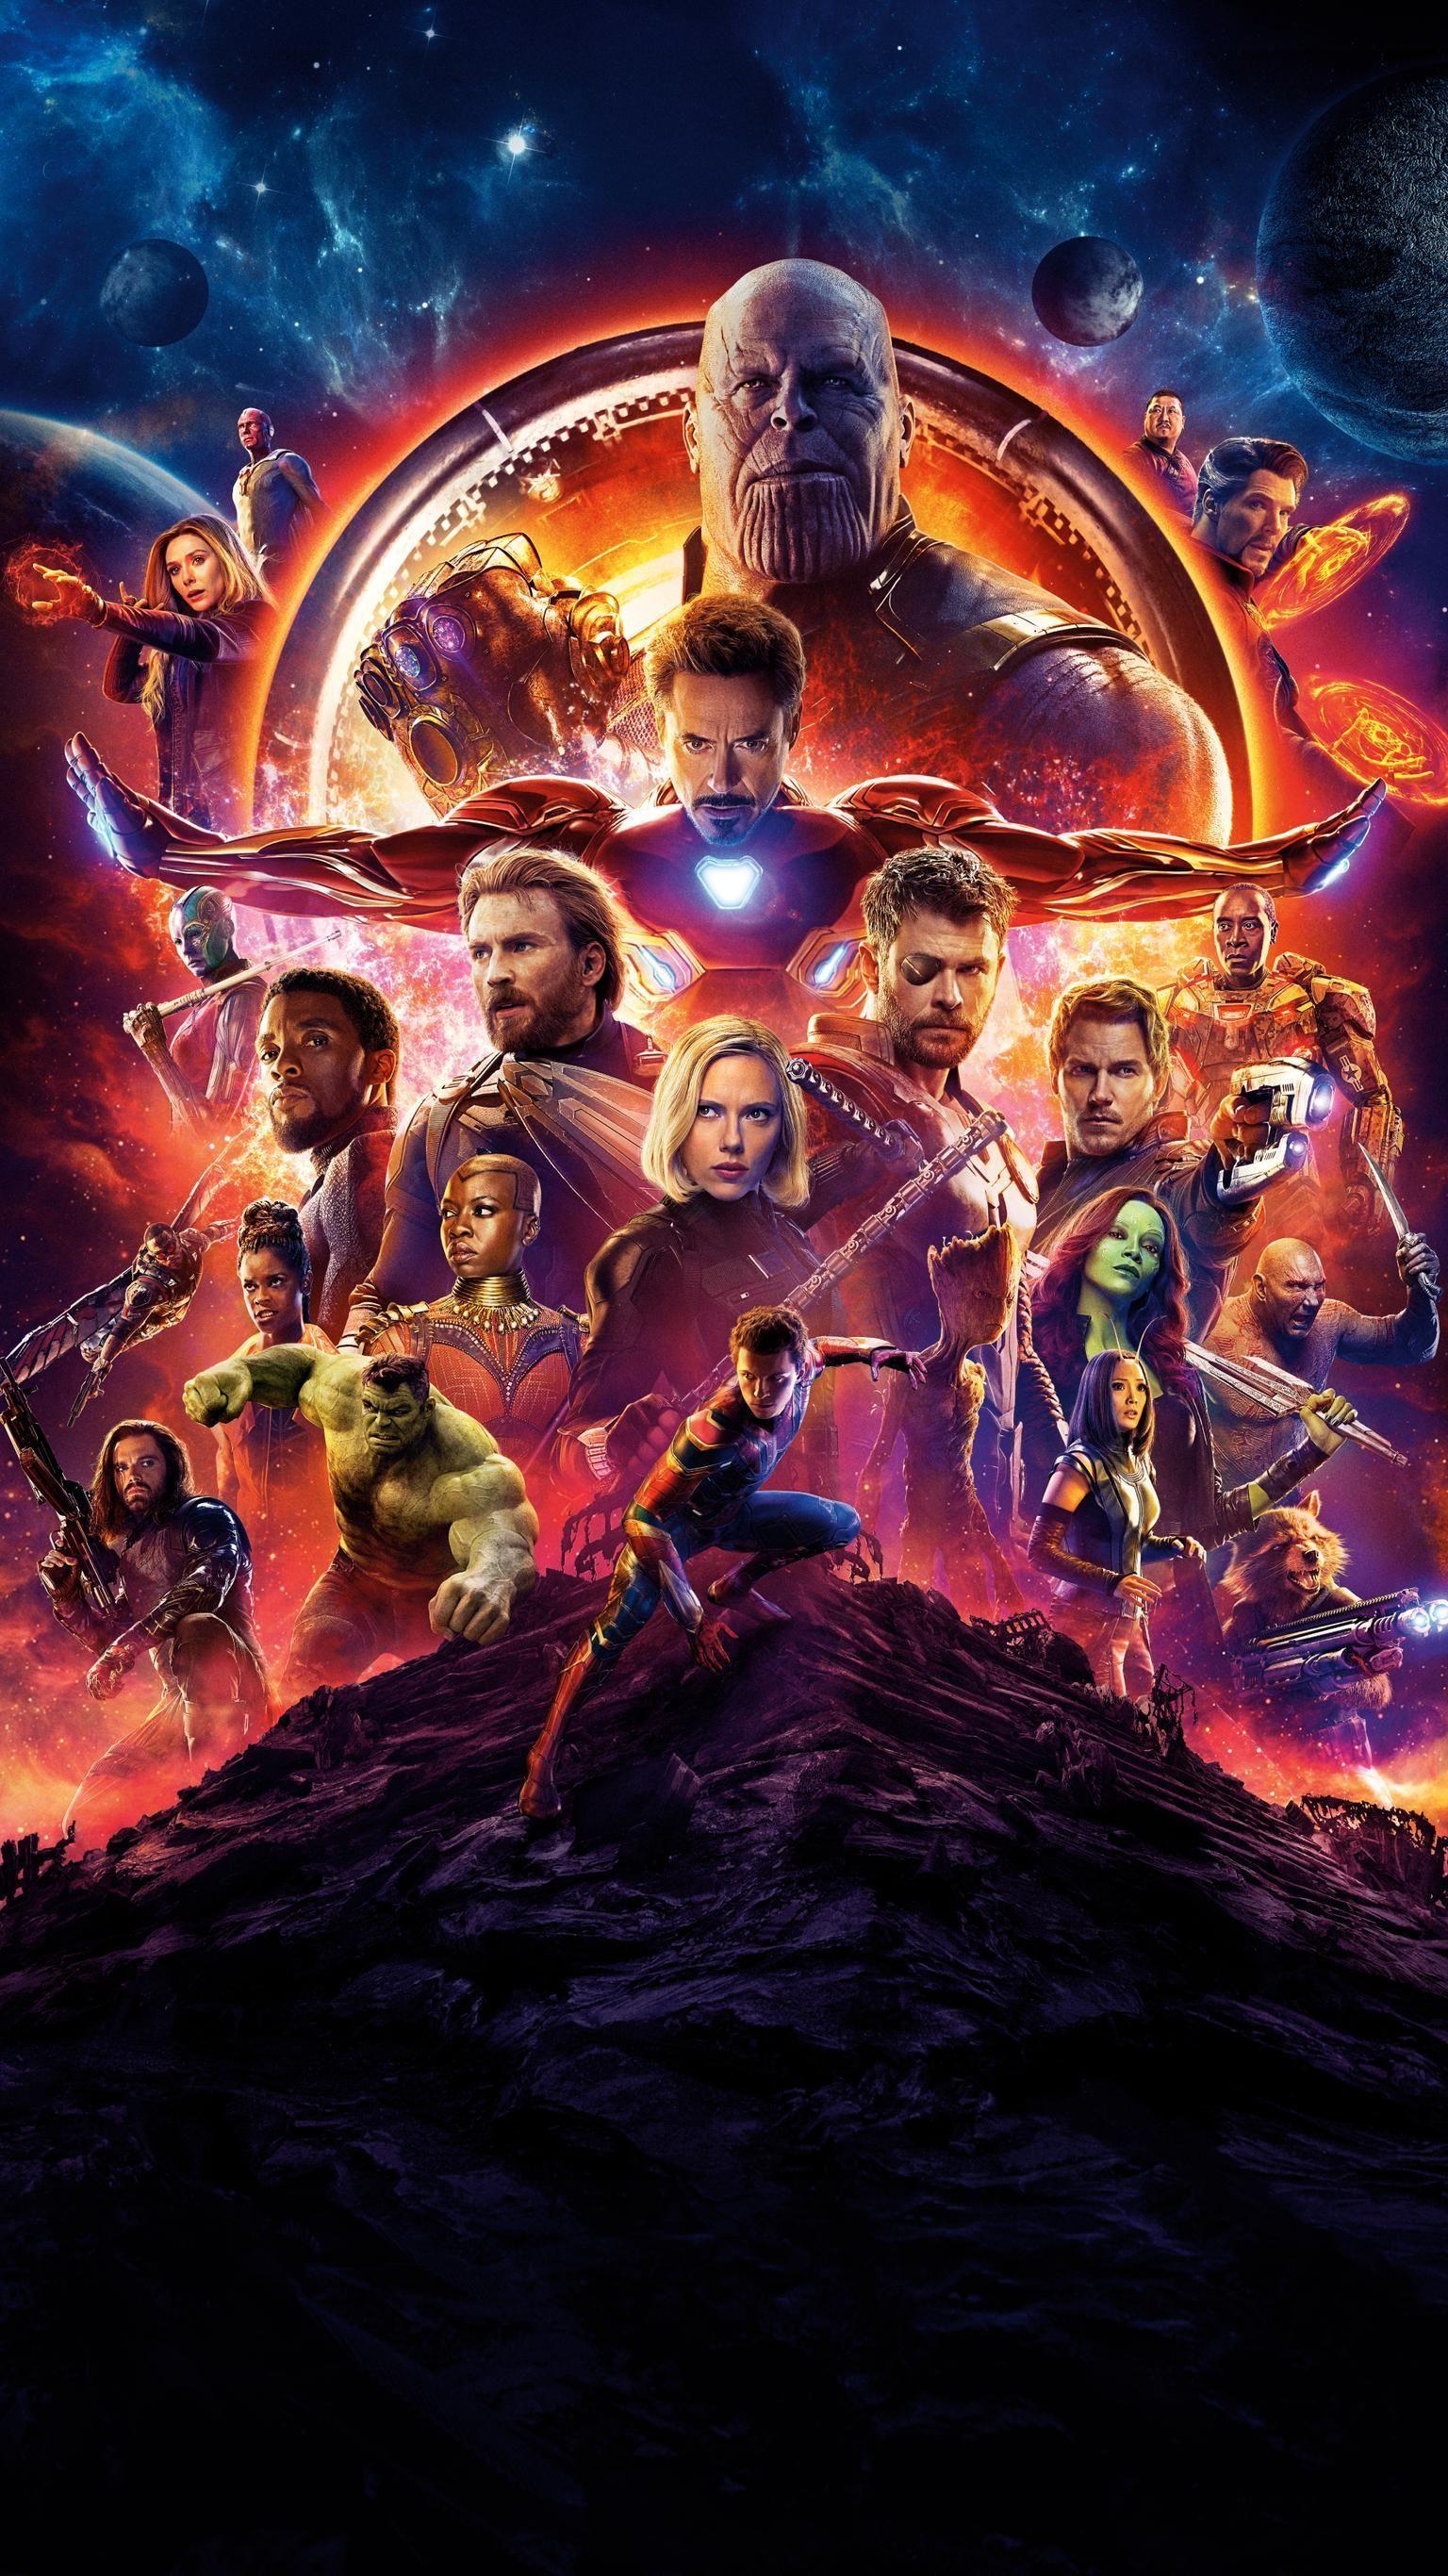 Avengers Full Hd Mobile Wallpapers Wallpaper Cave